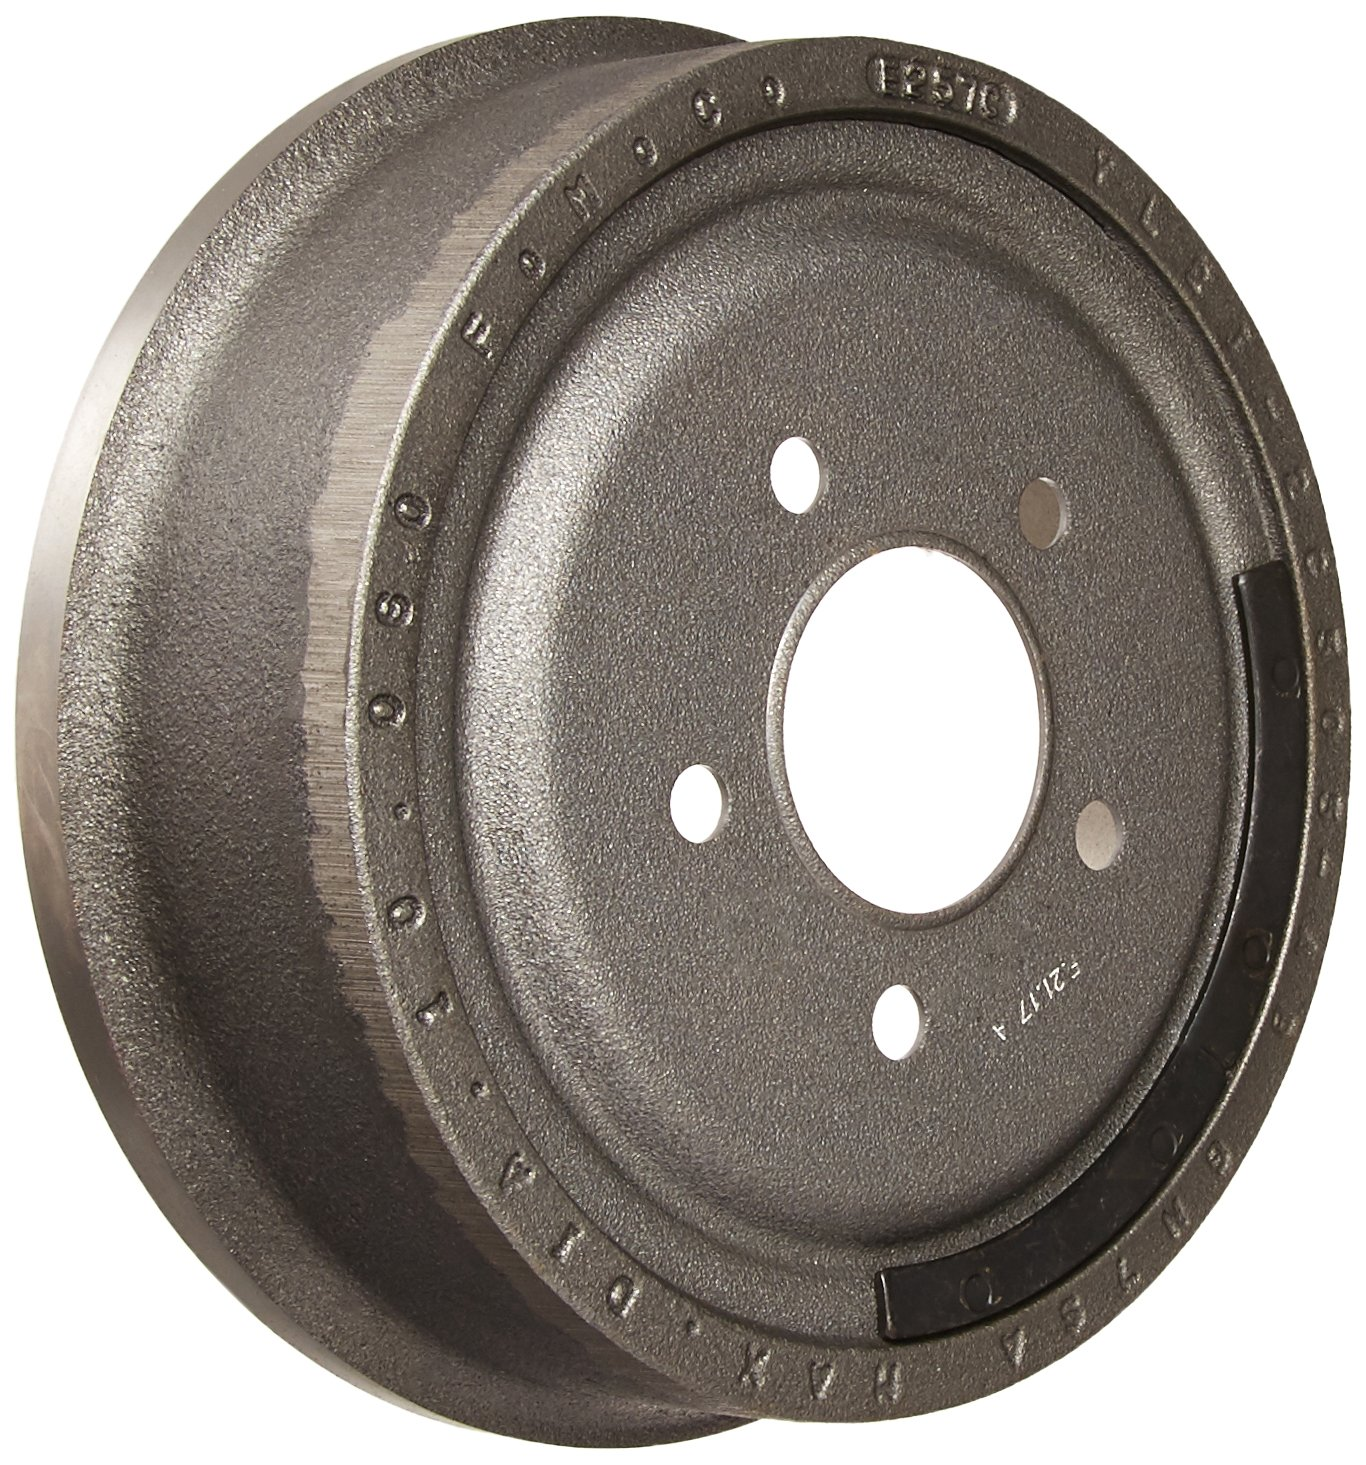 Rear Left Dynamic Friction Company Premium Brake Caliper 331-80661